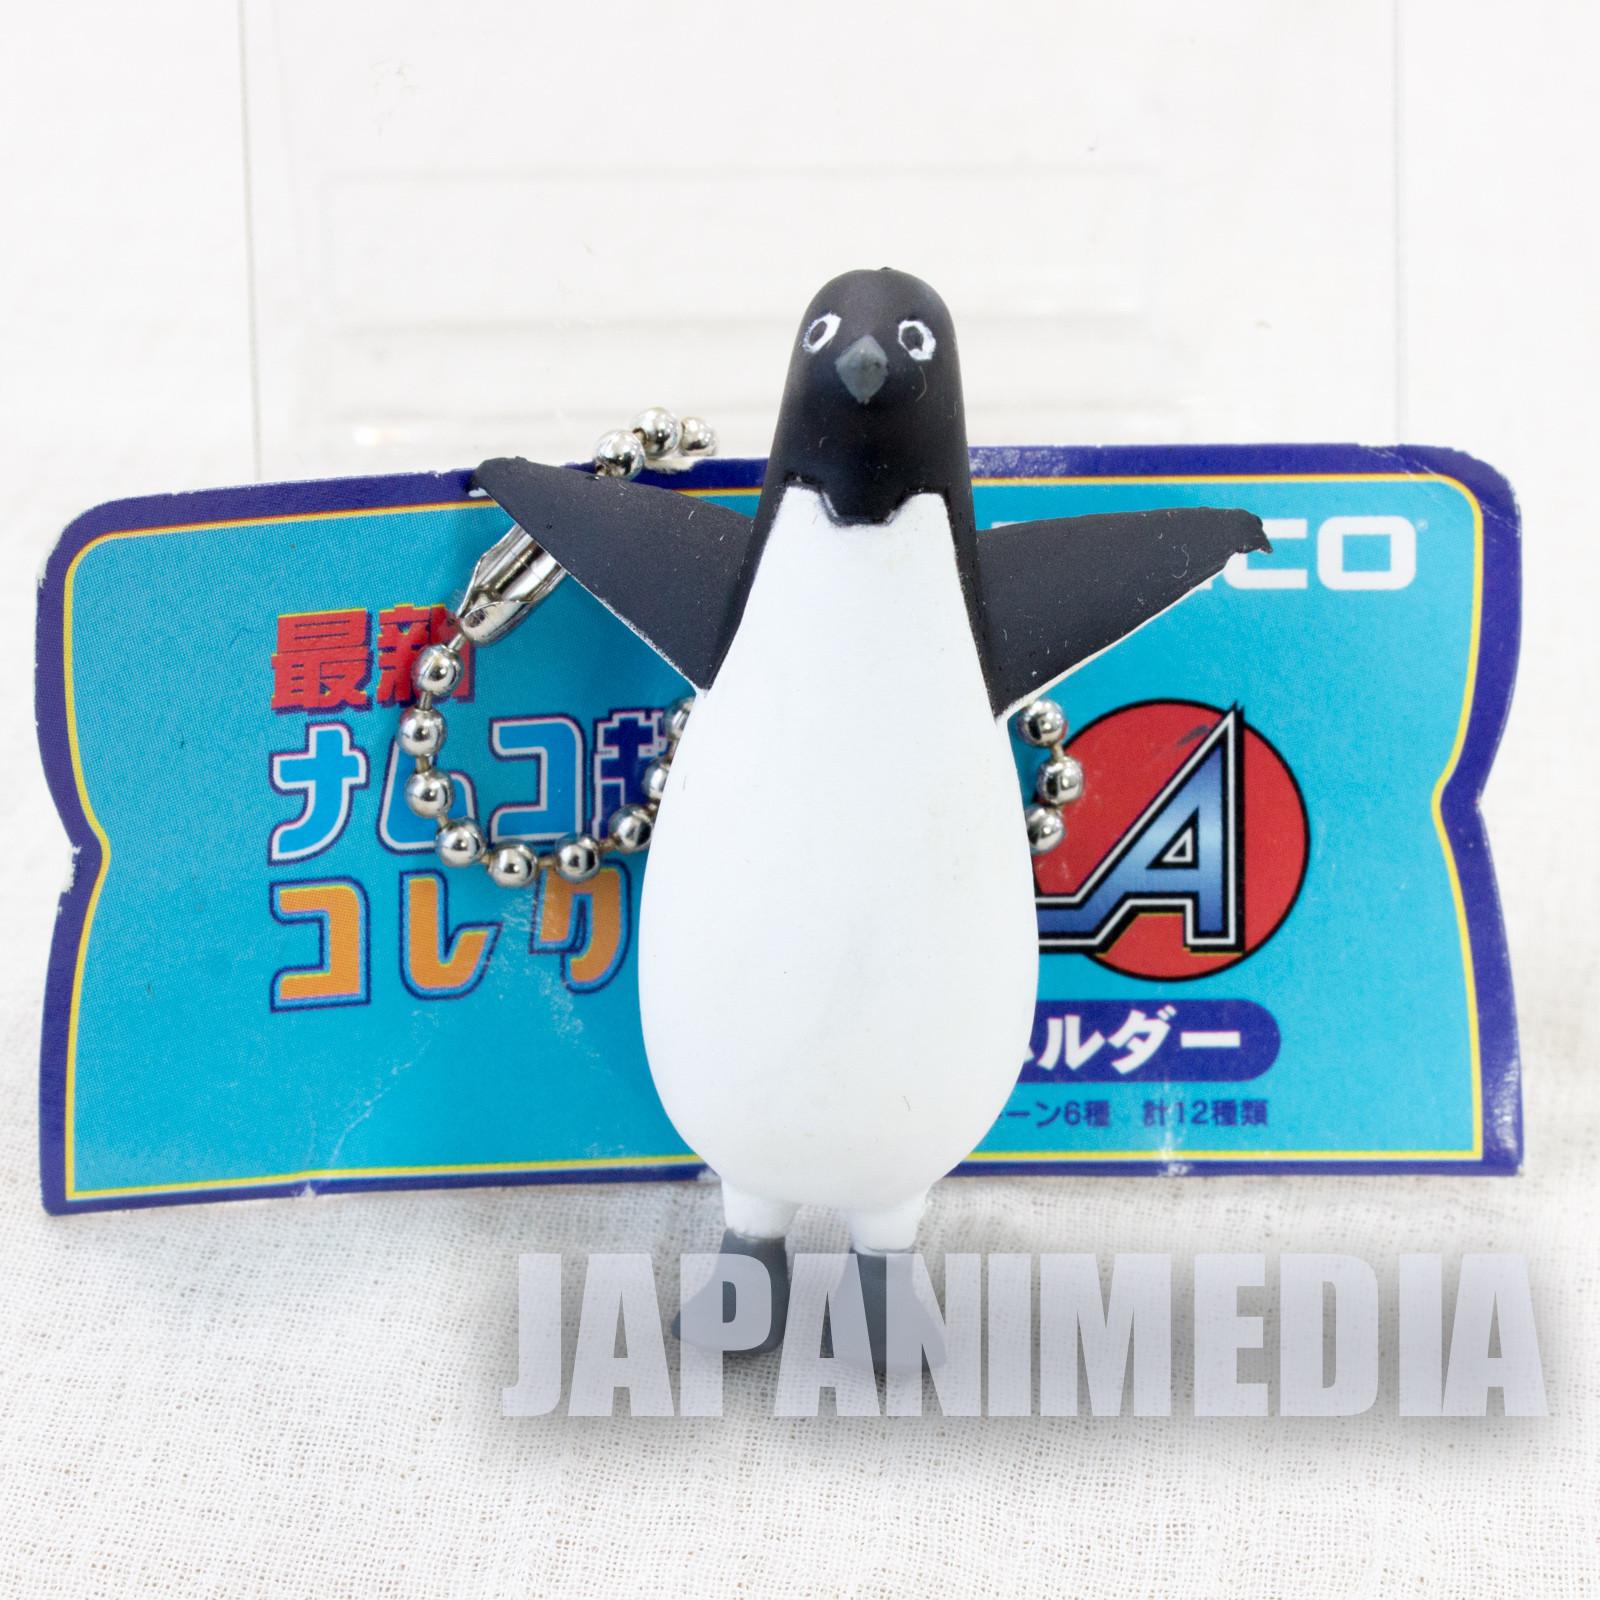 Retro Rare! Namco Game Character Penguin Figure Ballchain JAPAN